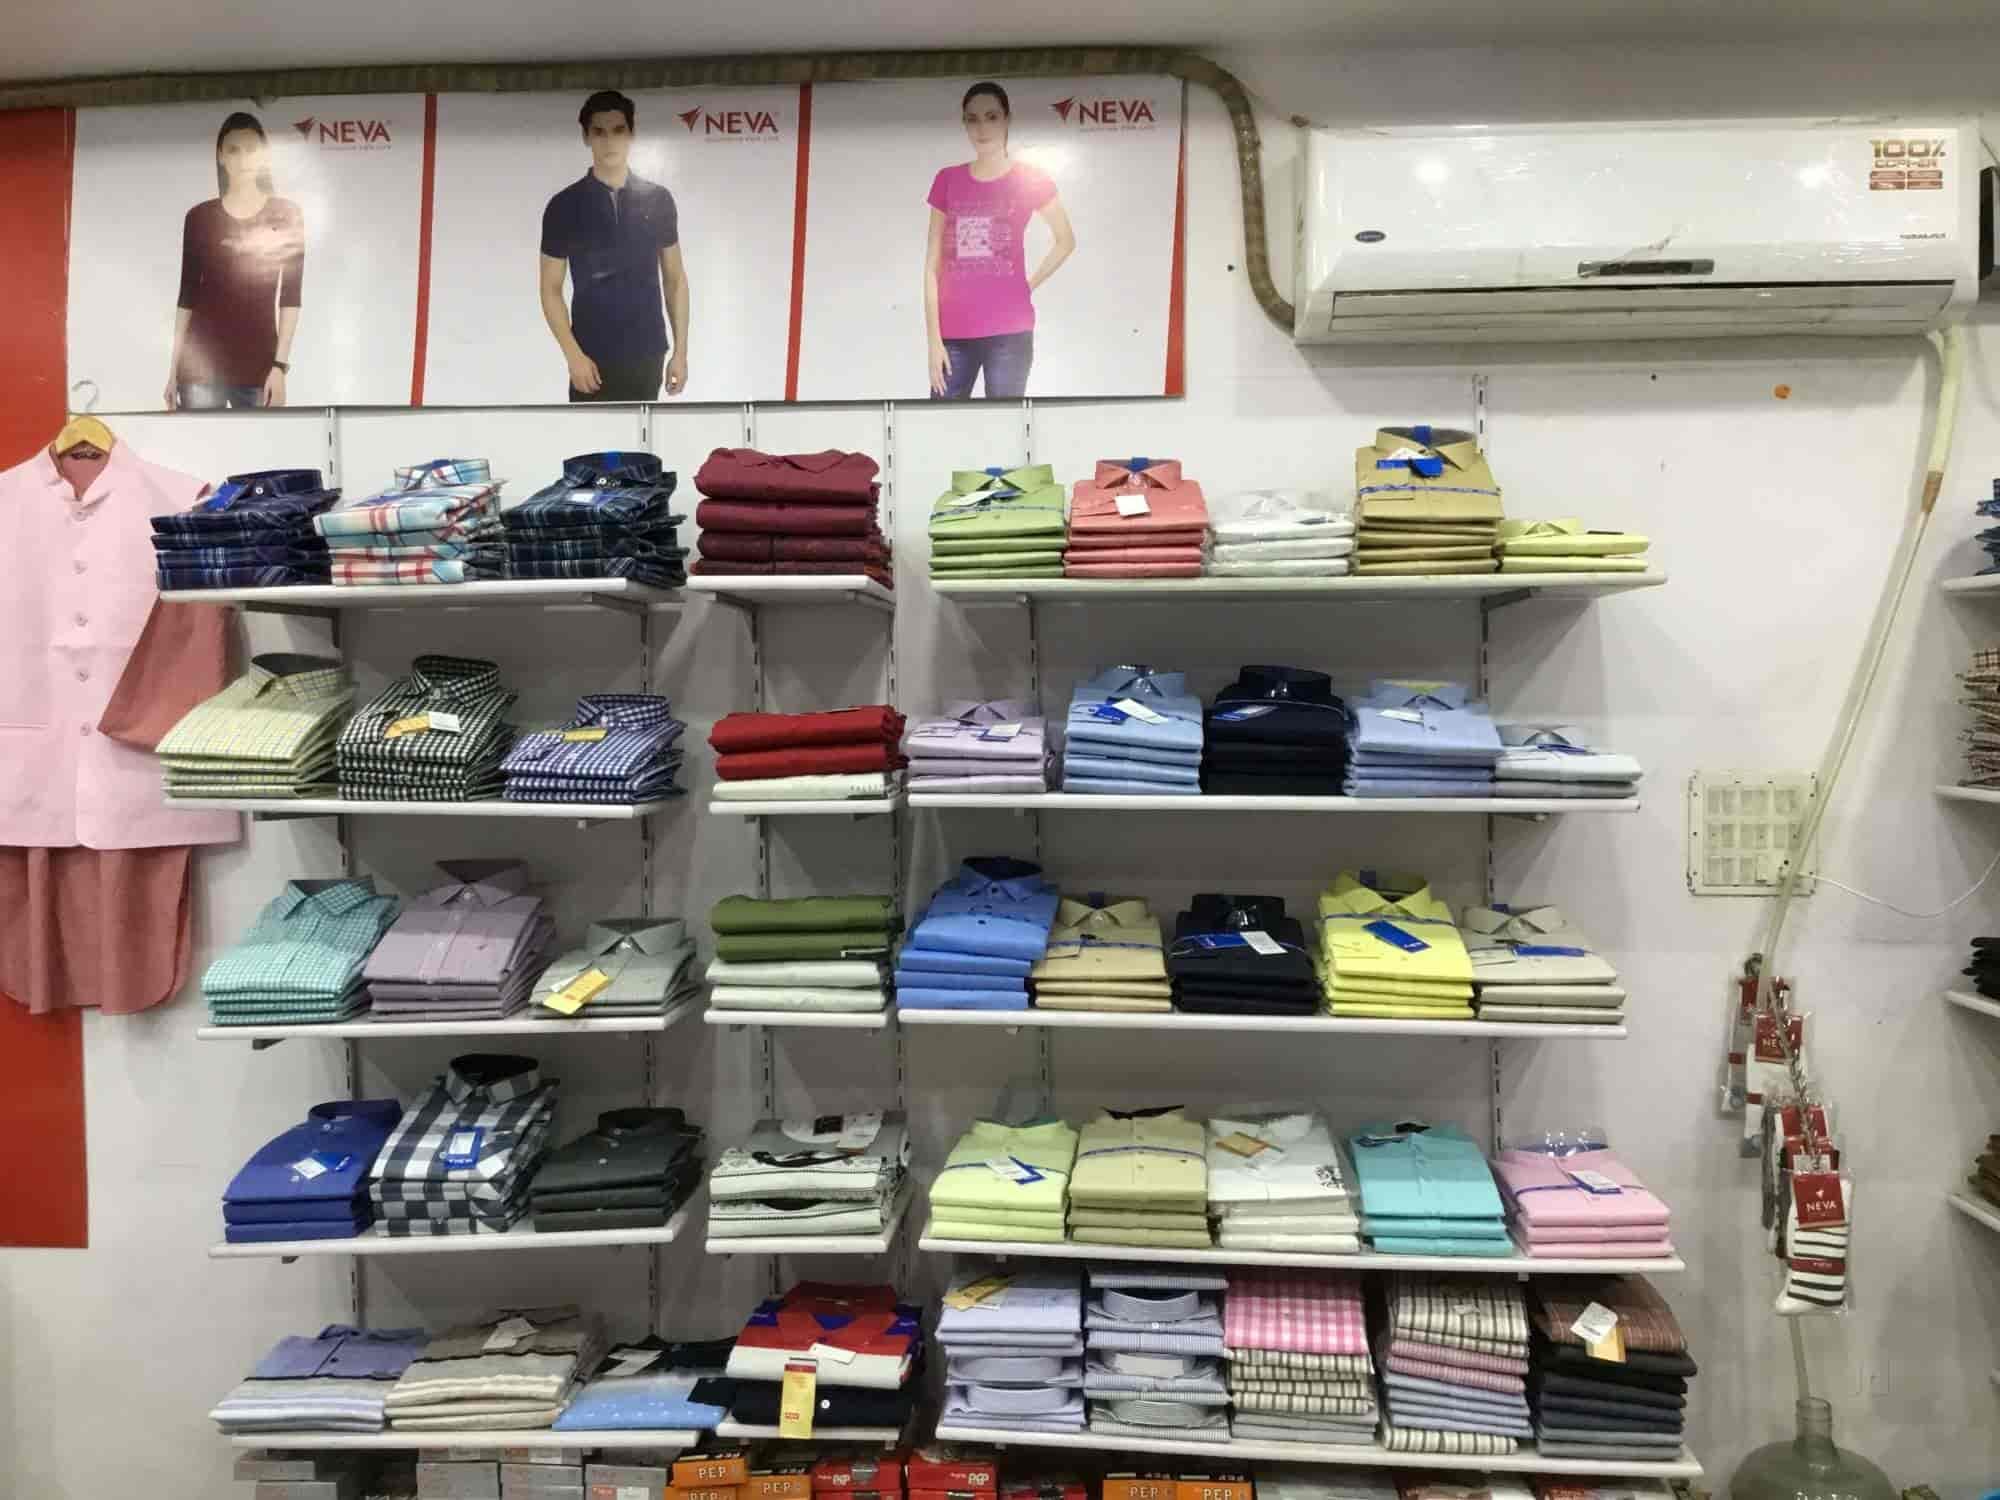 Top Neva Clothing For Life Photos Mahanagar Lucknow Readymade Garment  Retailers With Closets For Life